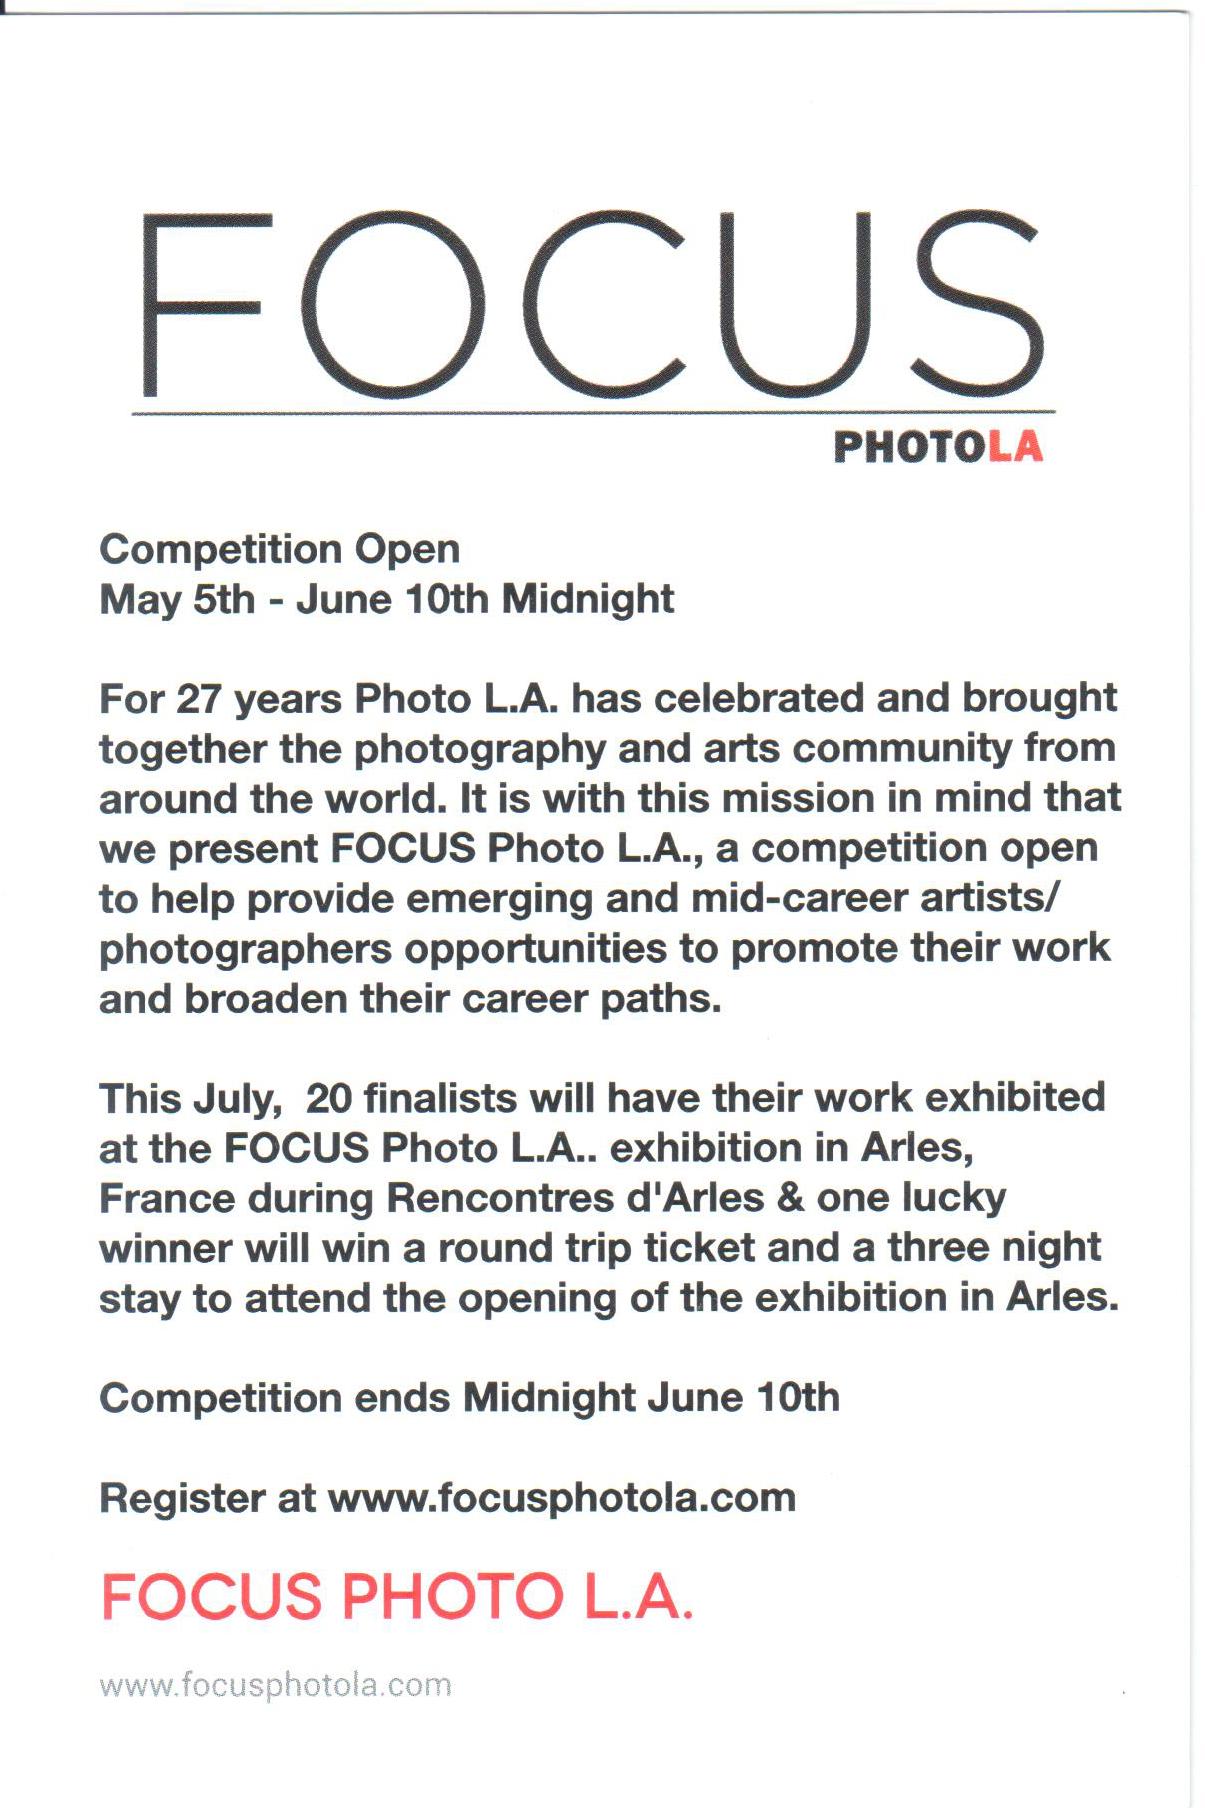 Focus PhotoLA 1.png